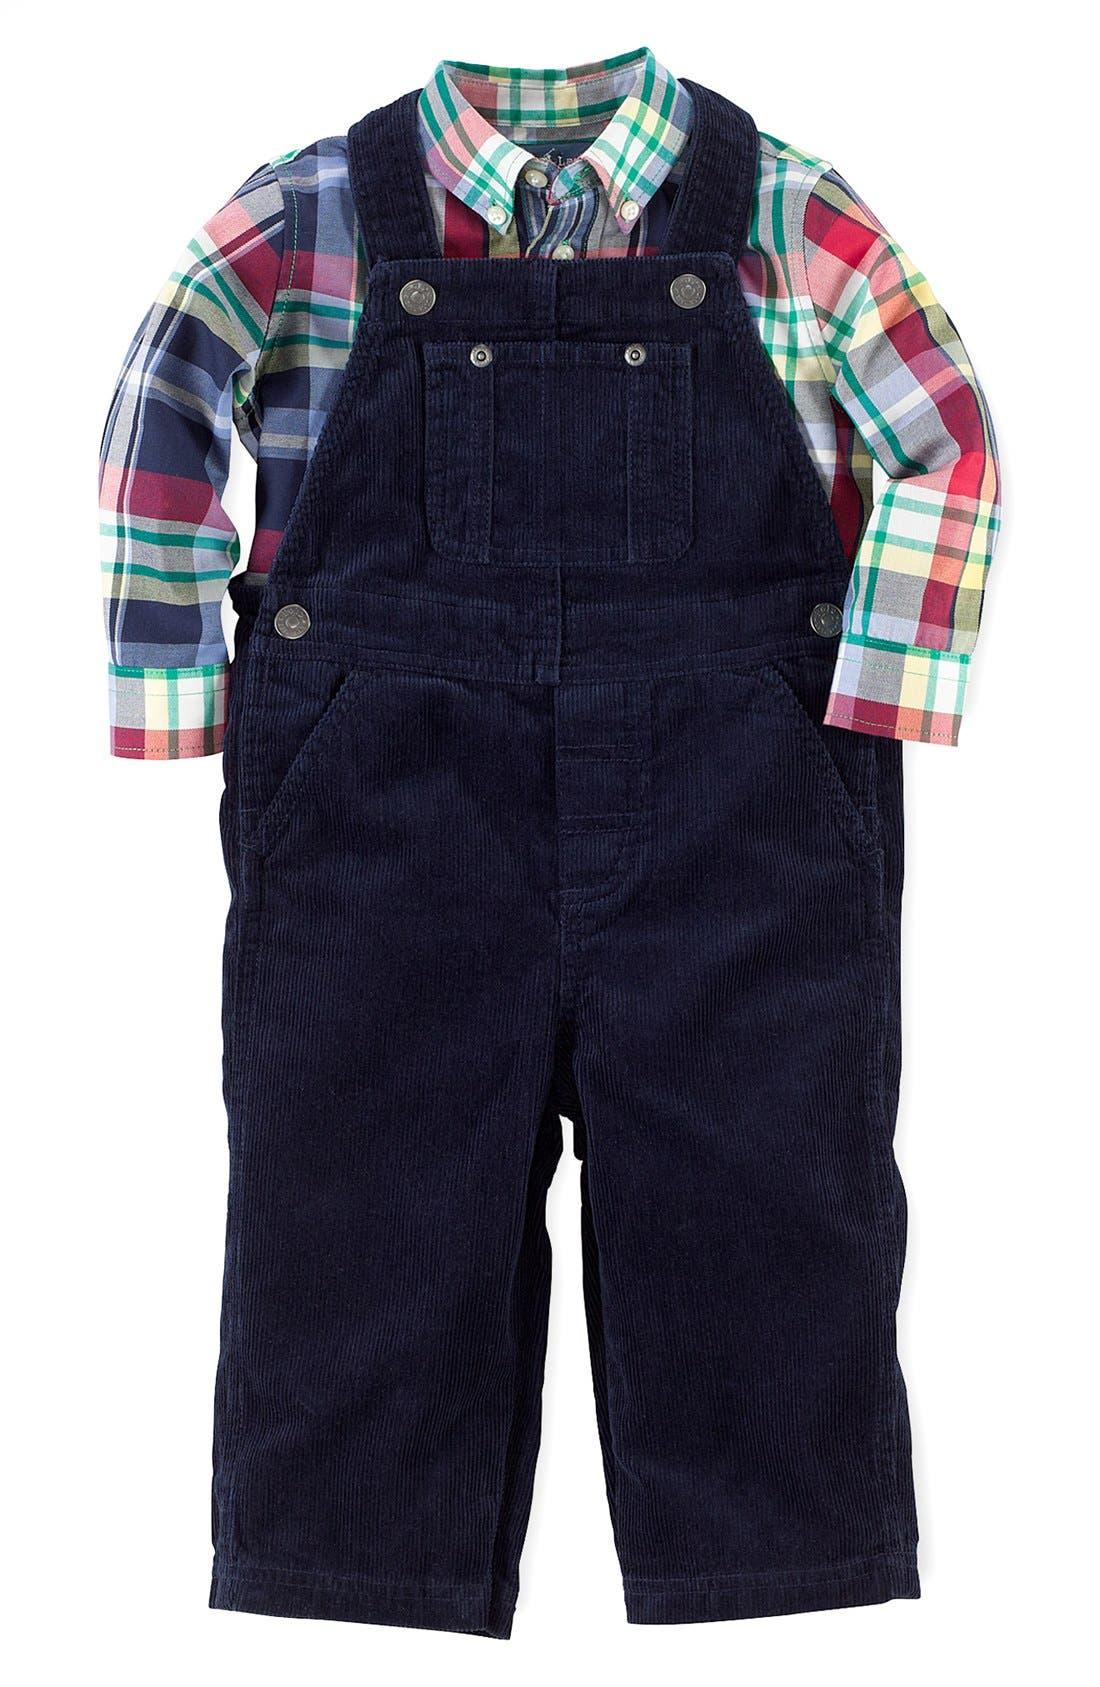 Main Image - Ralph Lauren Shirt & Overalls (Baby Boys)